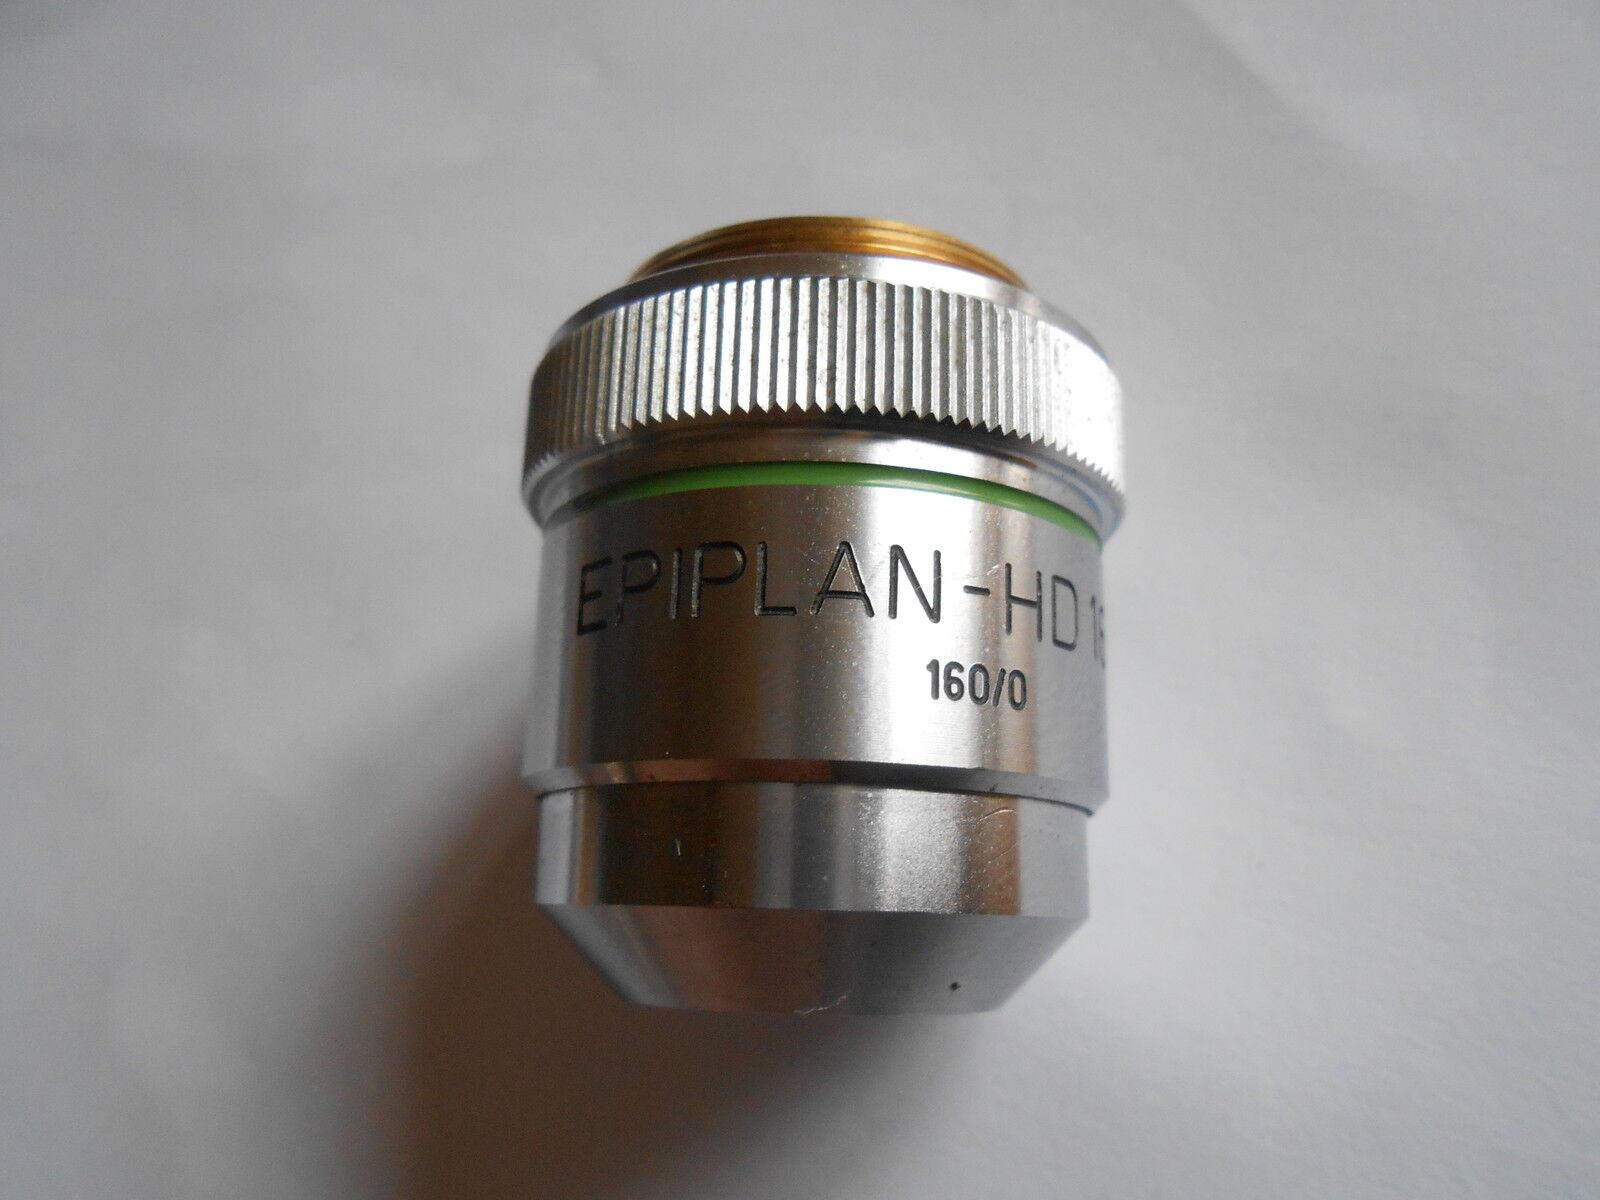 microscopepartsinc